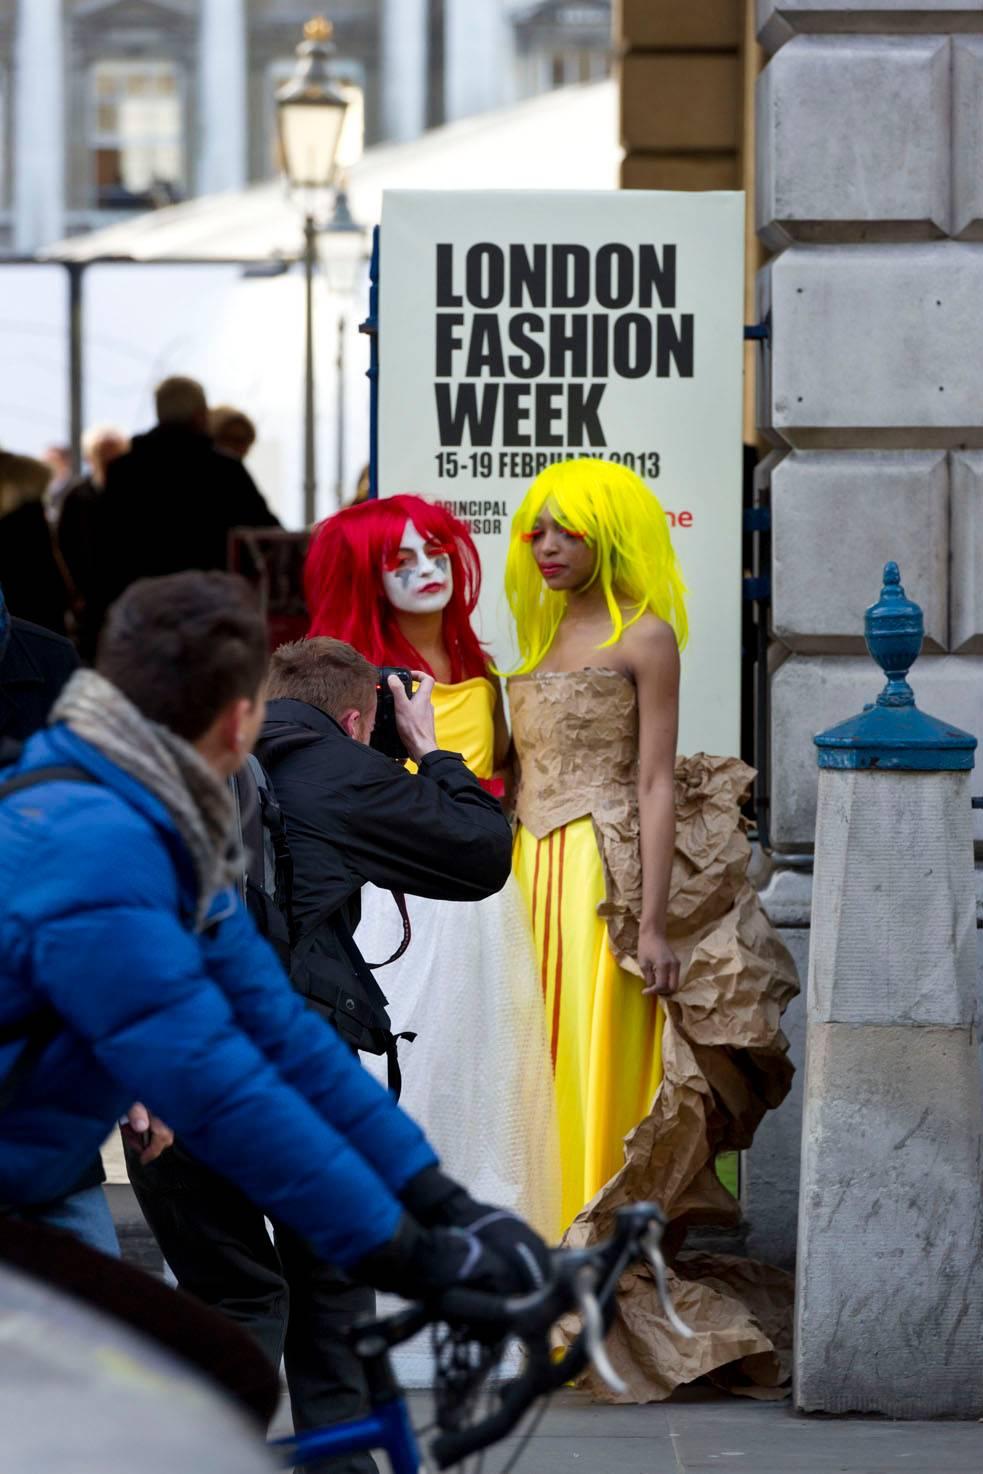 London Fashion Week protest